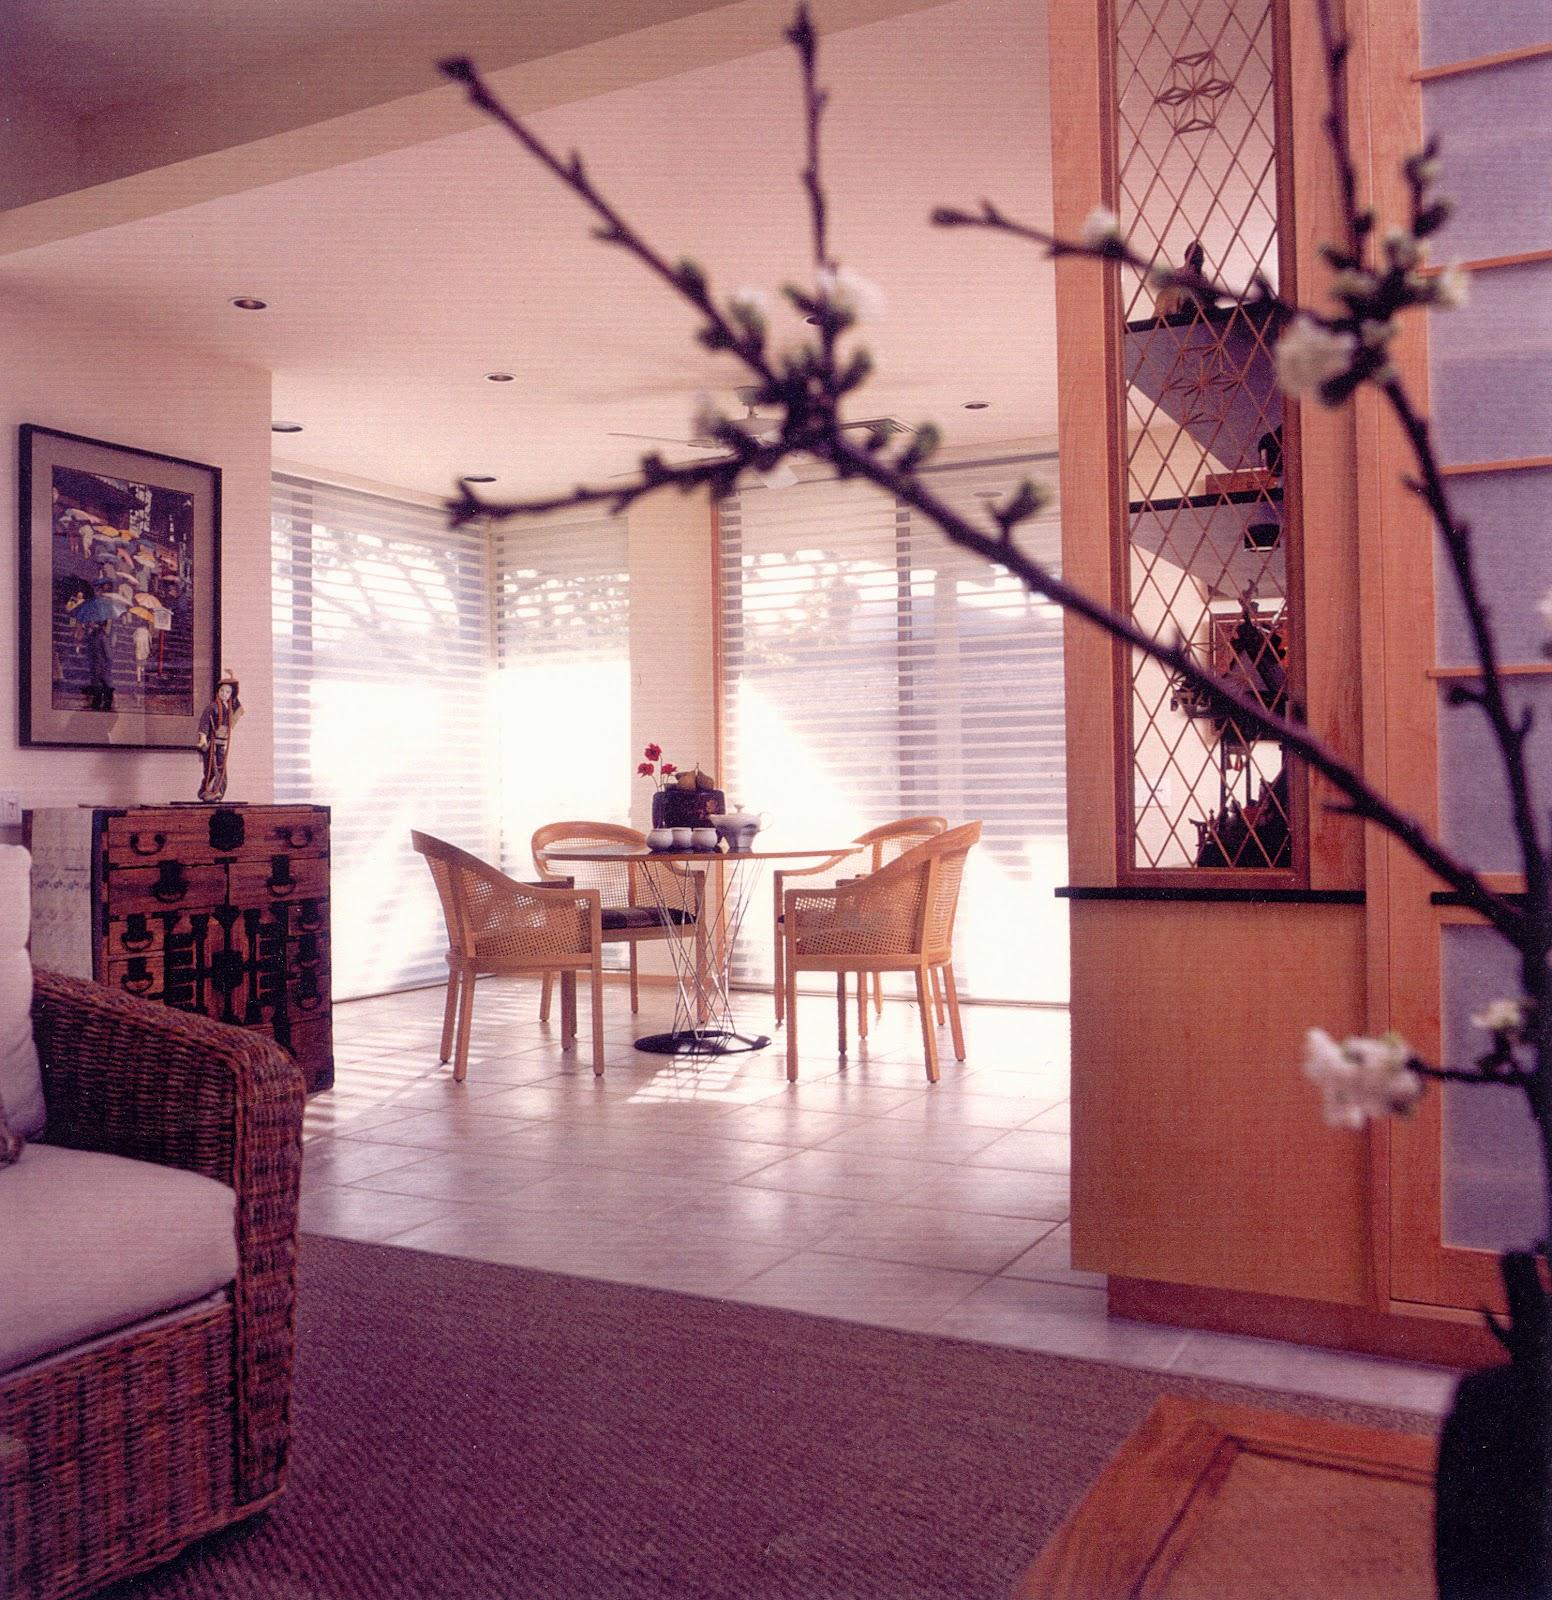 Shibui Articles: Interiors With Tansu 1